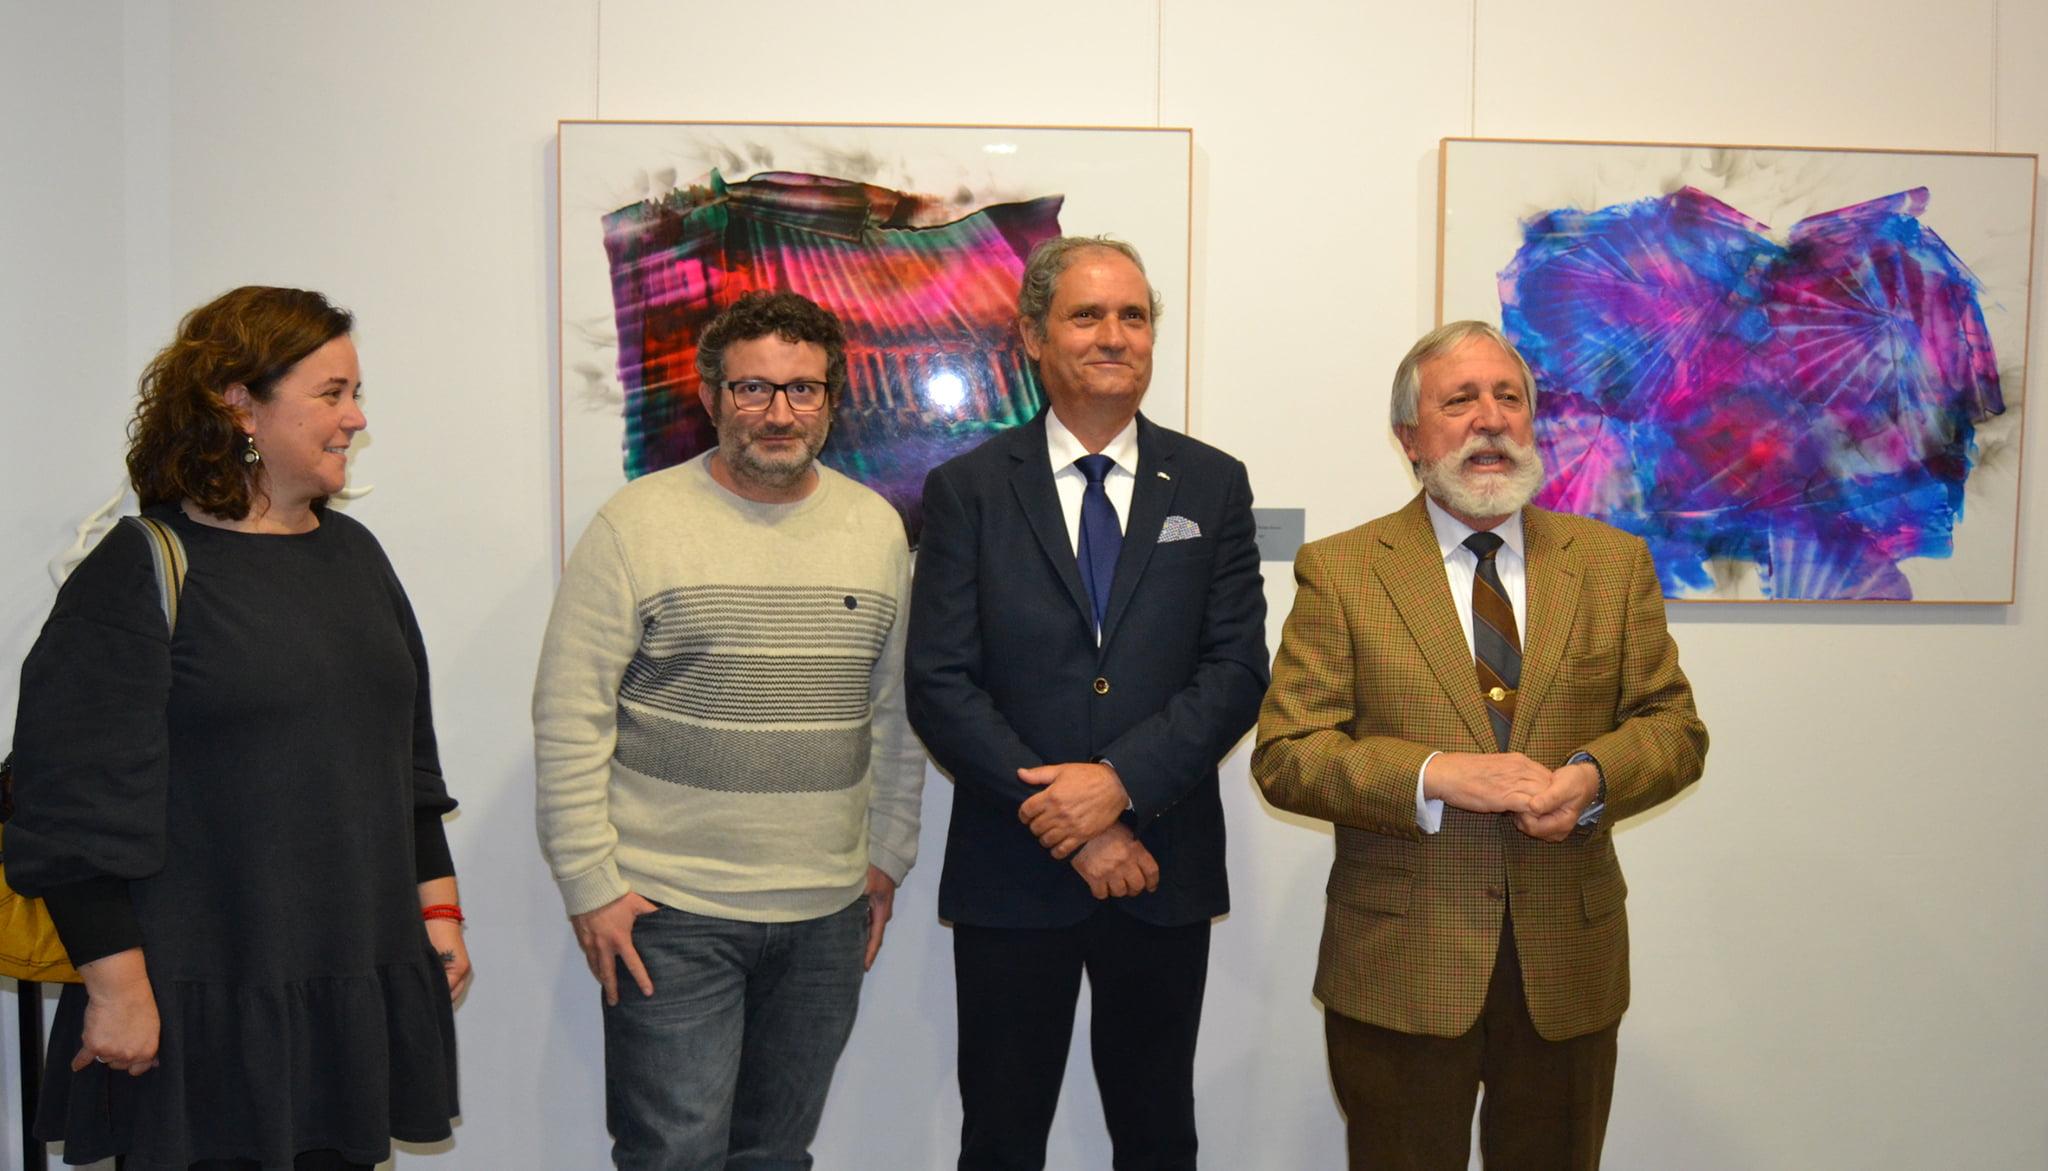 Galeria d'Art Toni Marí